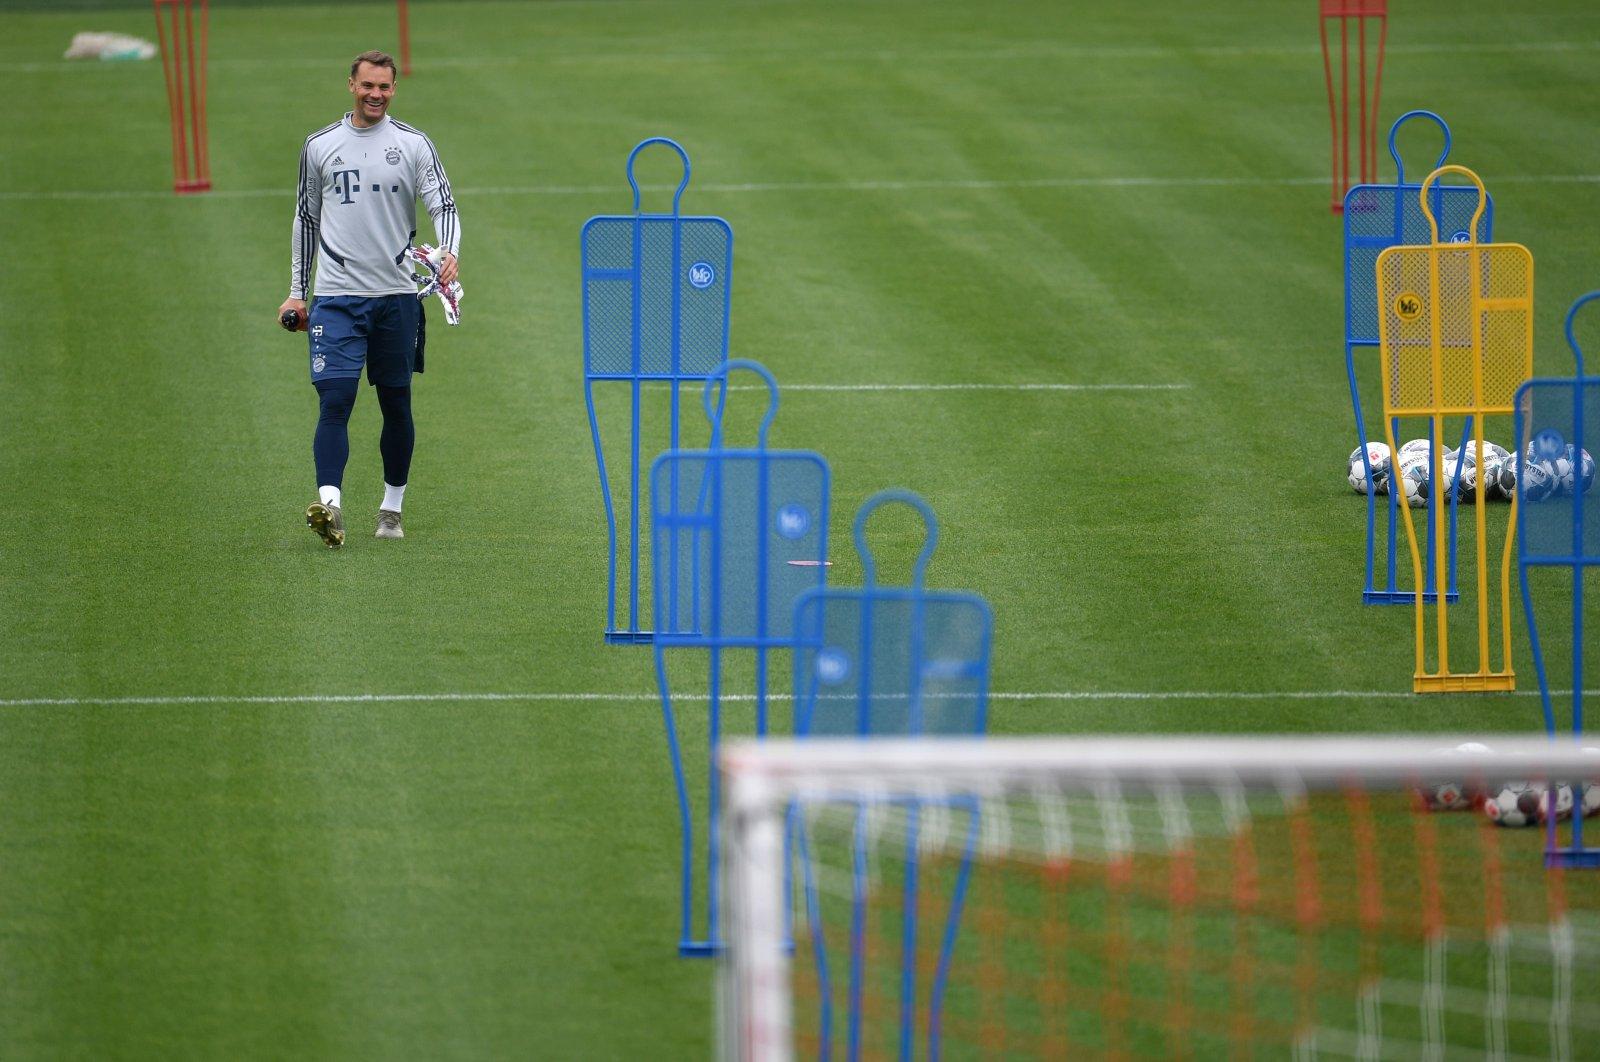 Bayern Munich's Manuel Neuer during training, in Munich, Germany, May 5, 2020. (Reuters Photo)